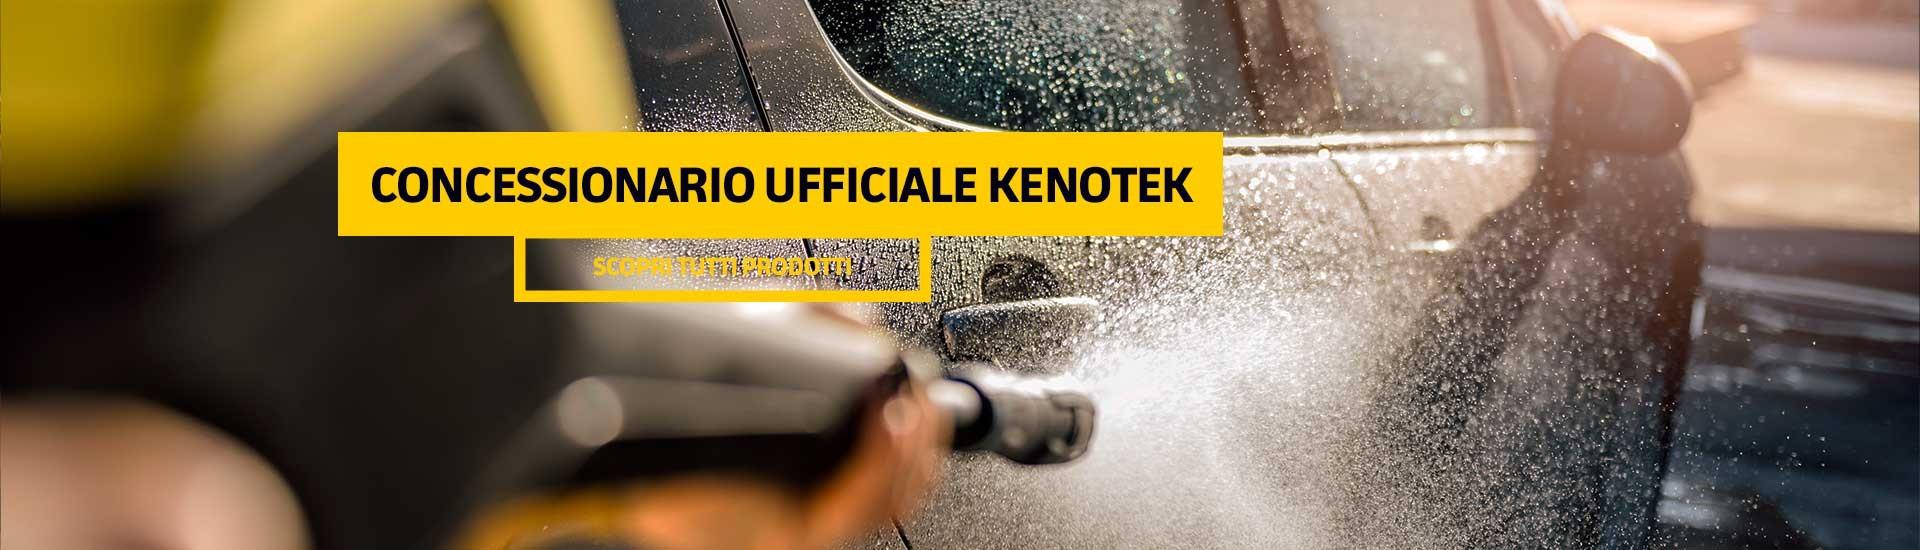 Concessionario Ufficiale Kenotek